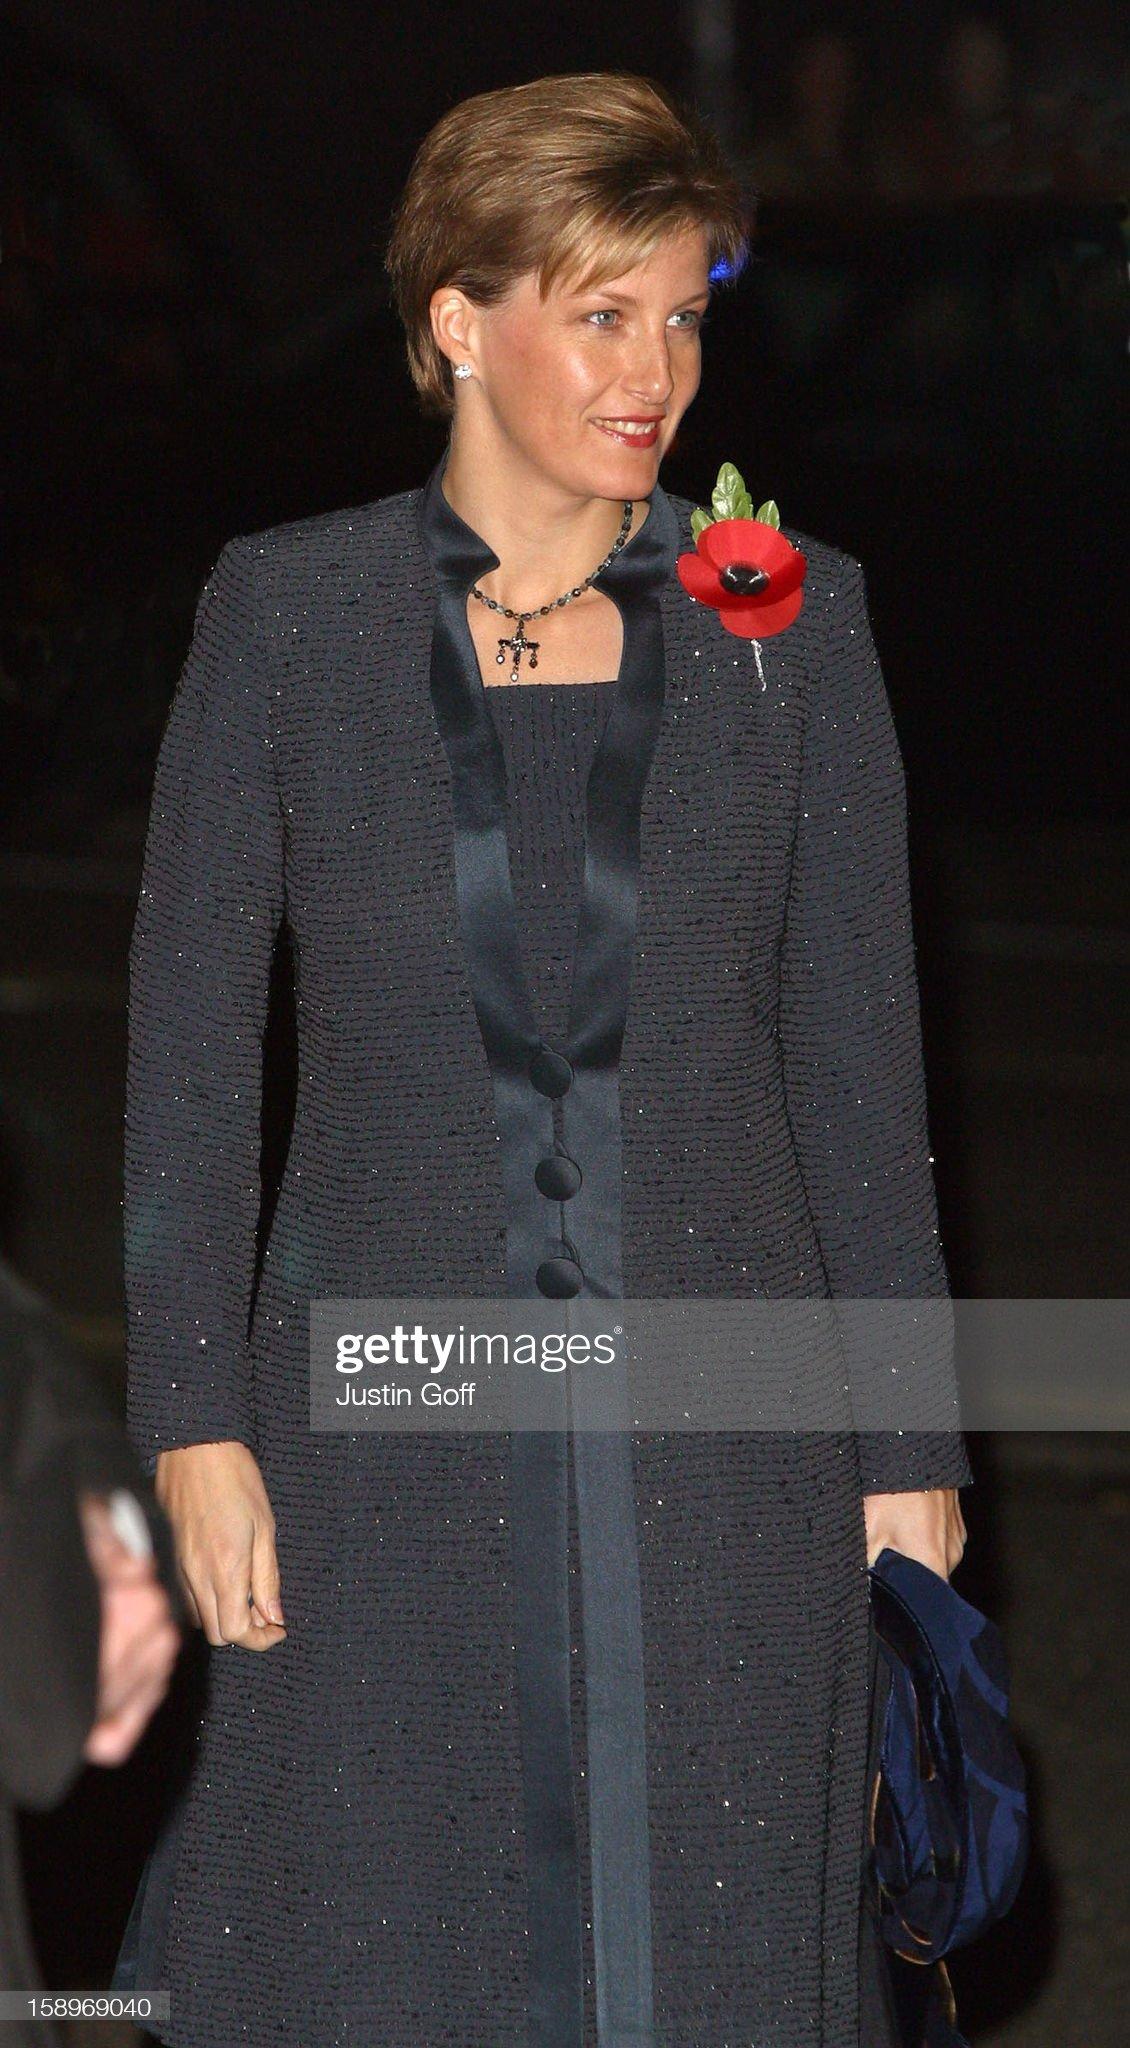 Royal British Legion Festival Of Remembrance Performance At London Royal Albert Hall. : News Photo